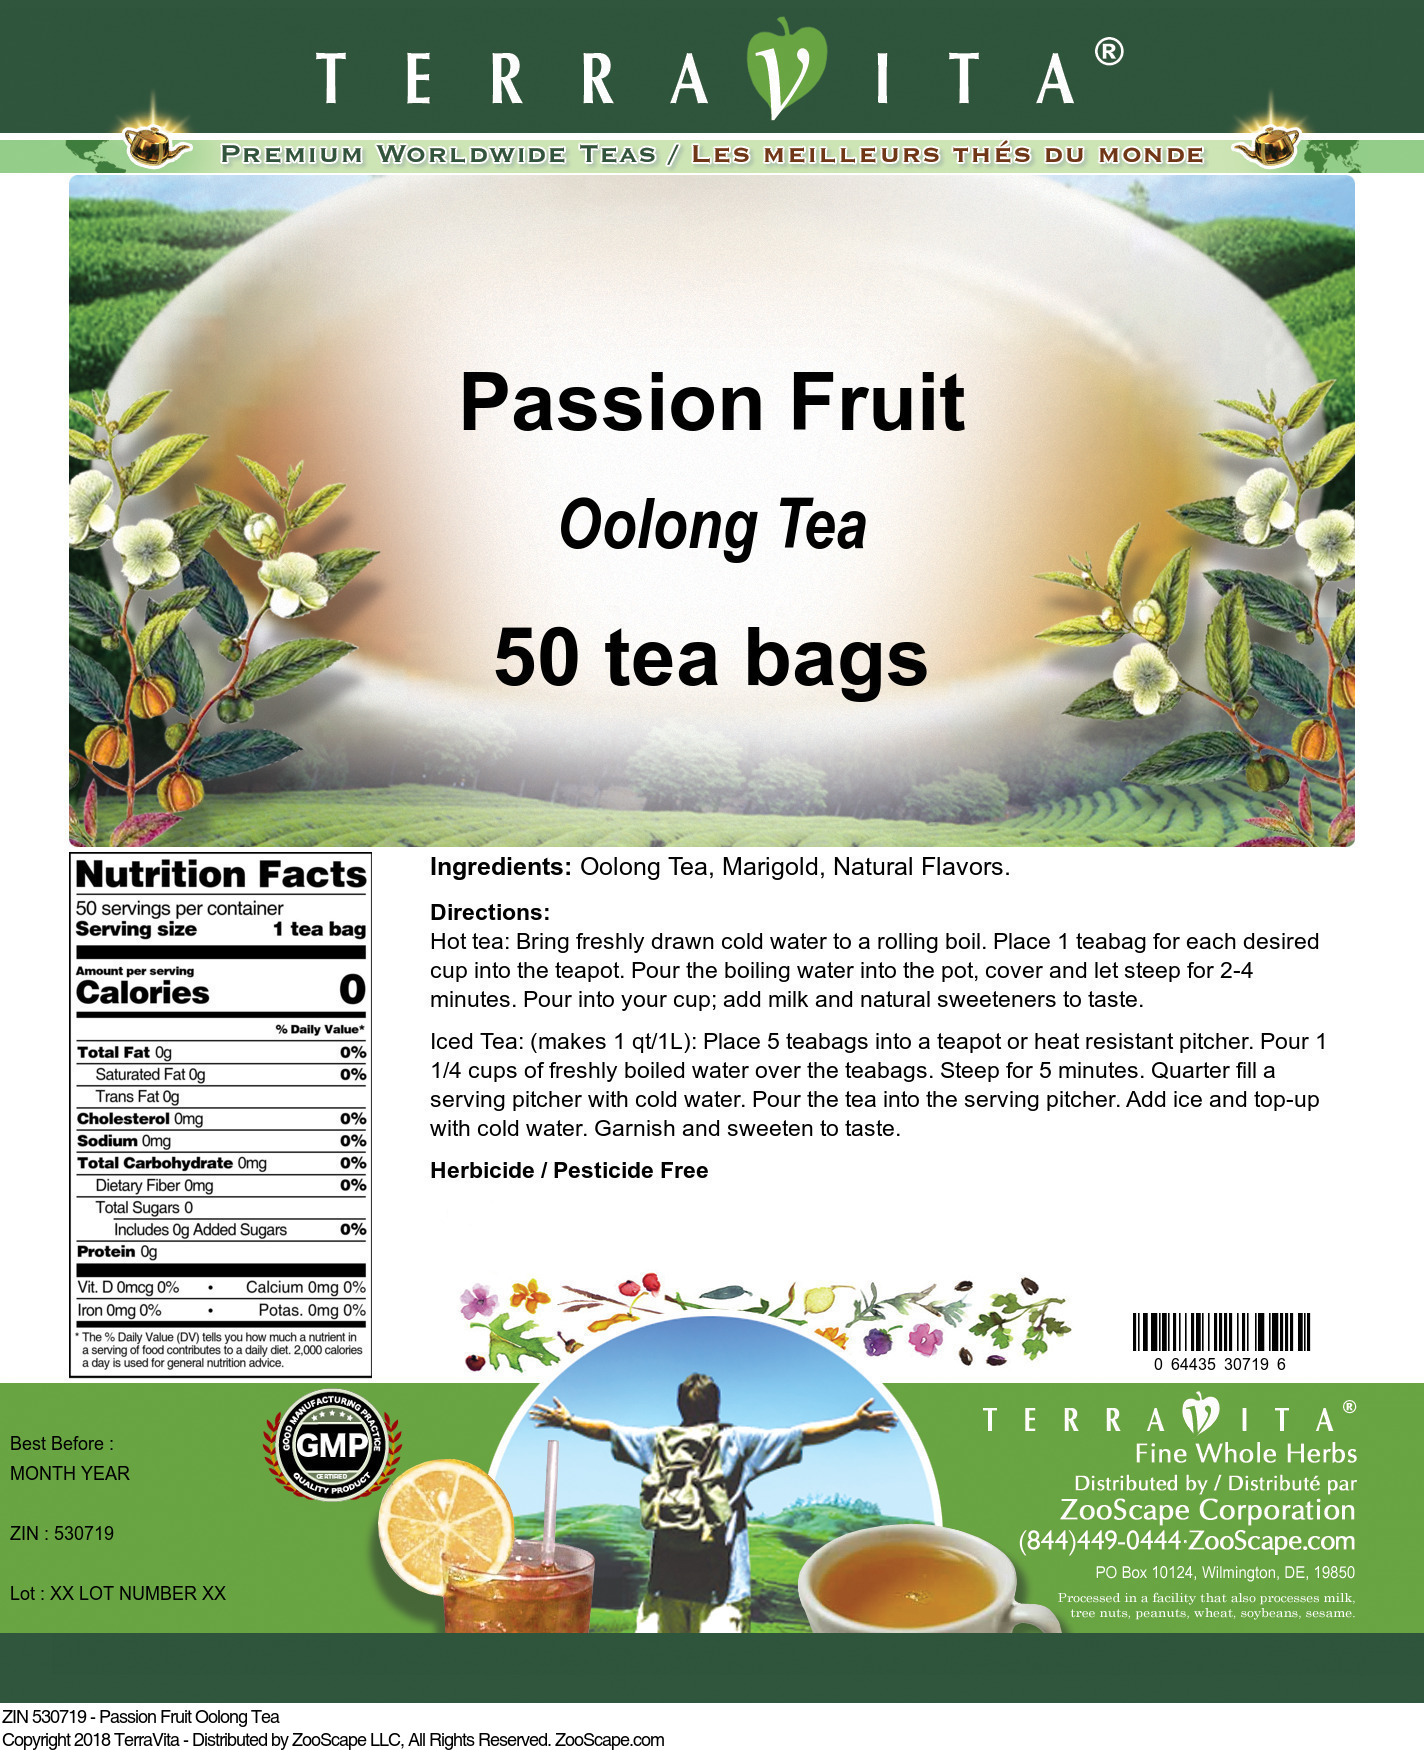 Passion Fruit Oolong Tea